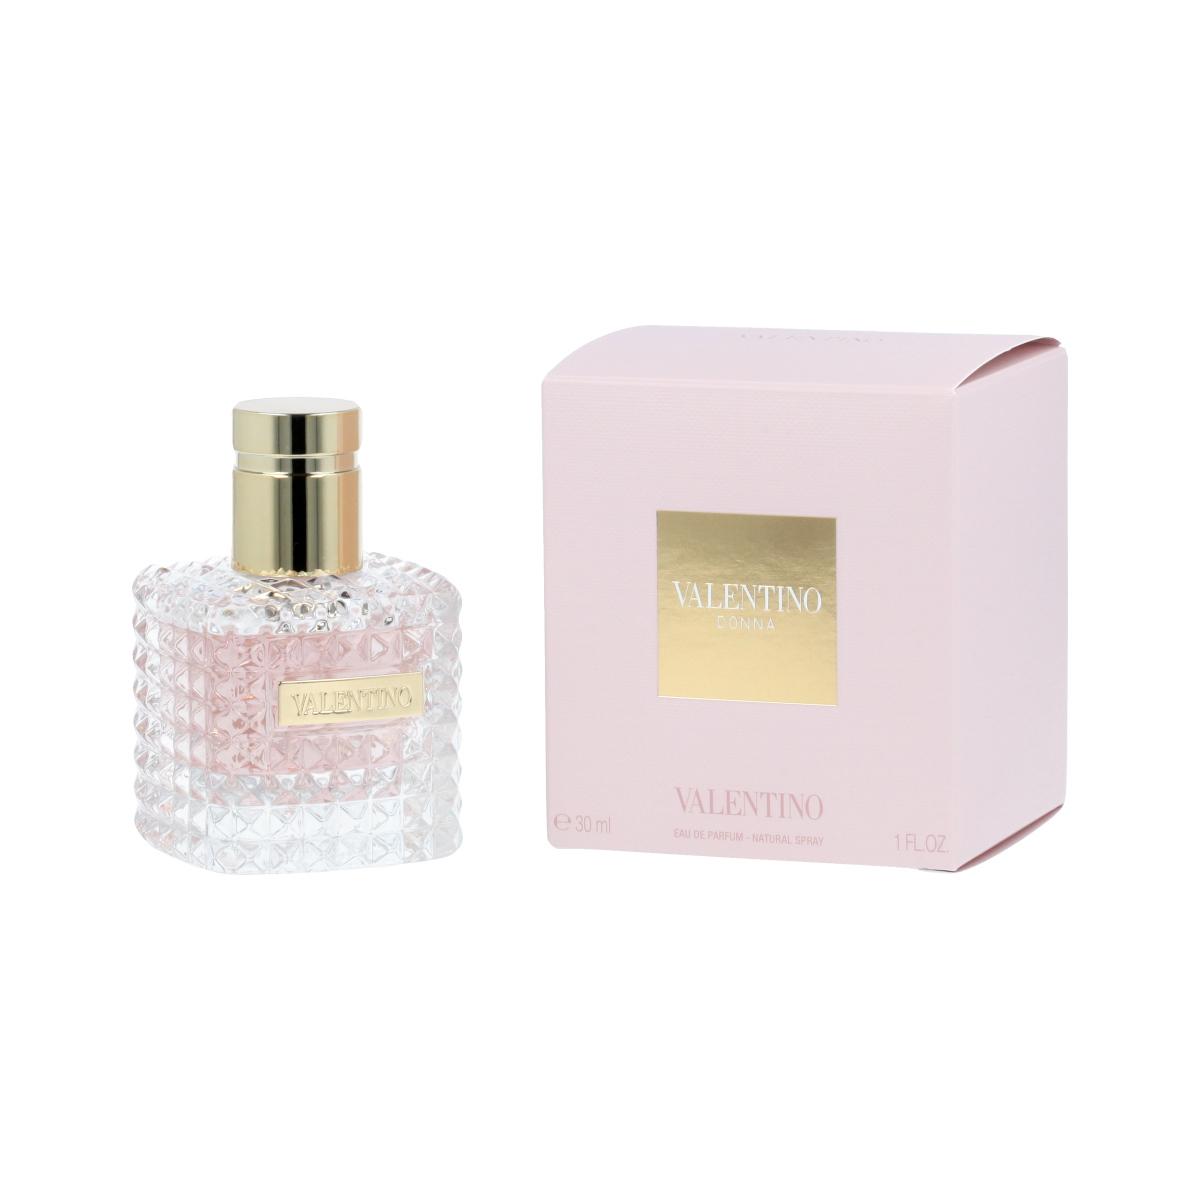 Valentino Valentino Donna Eau De Parfum 30 ml (woman) 87825